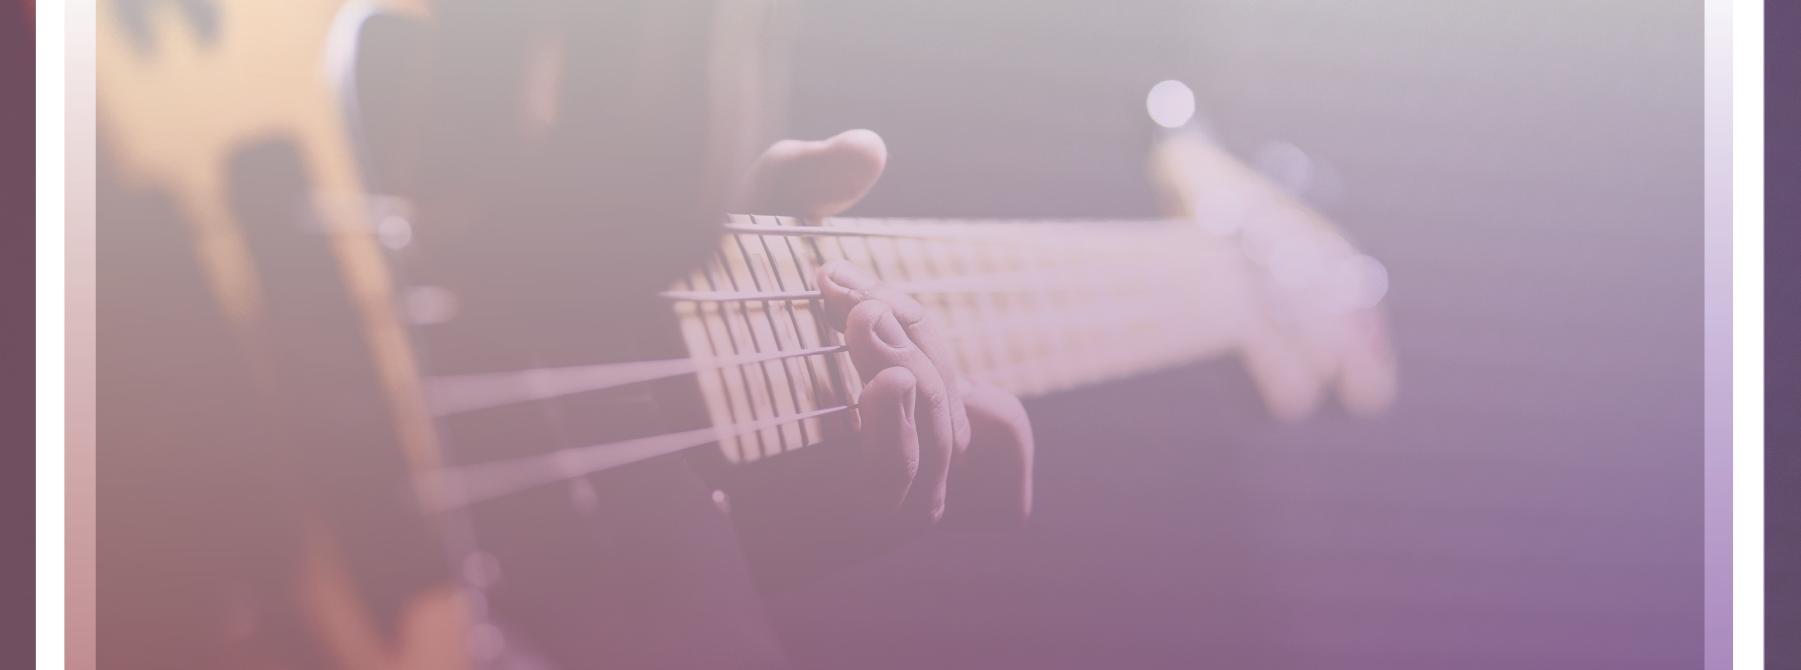 EvenVision Blog Post - Eureka Music Store Example